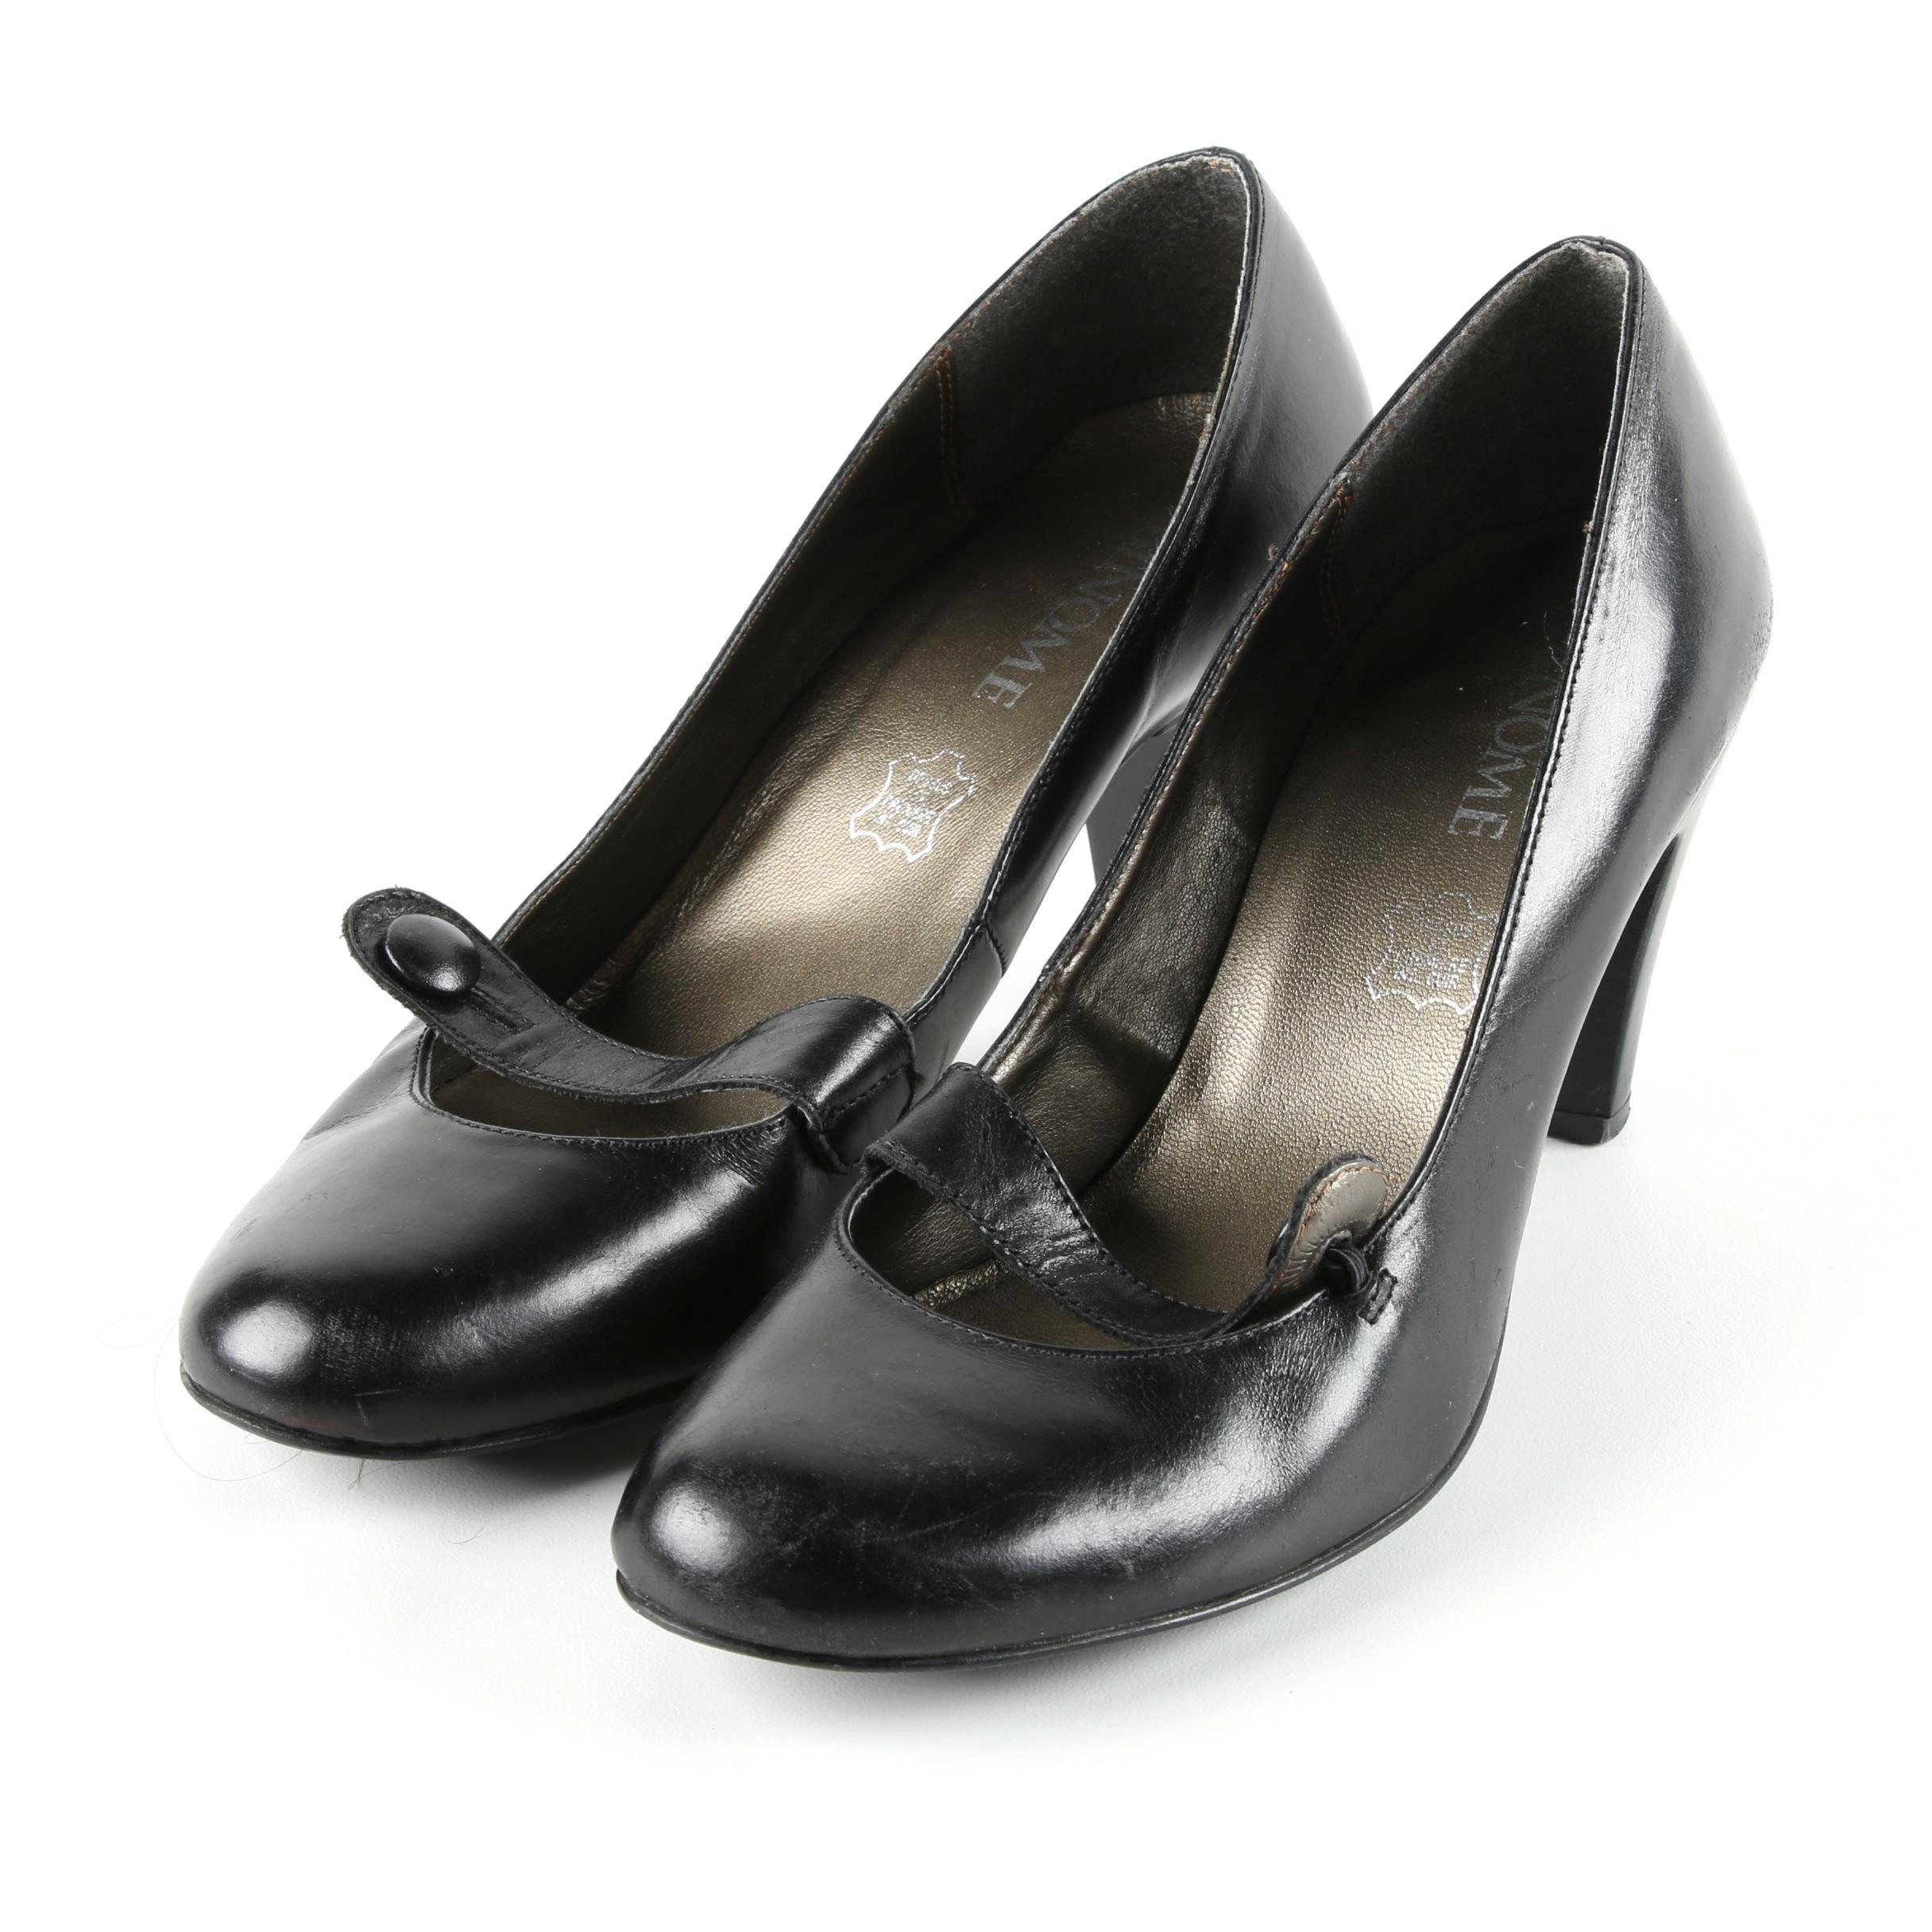 Binome Black Leather High Heels Pumps